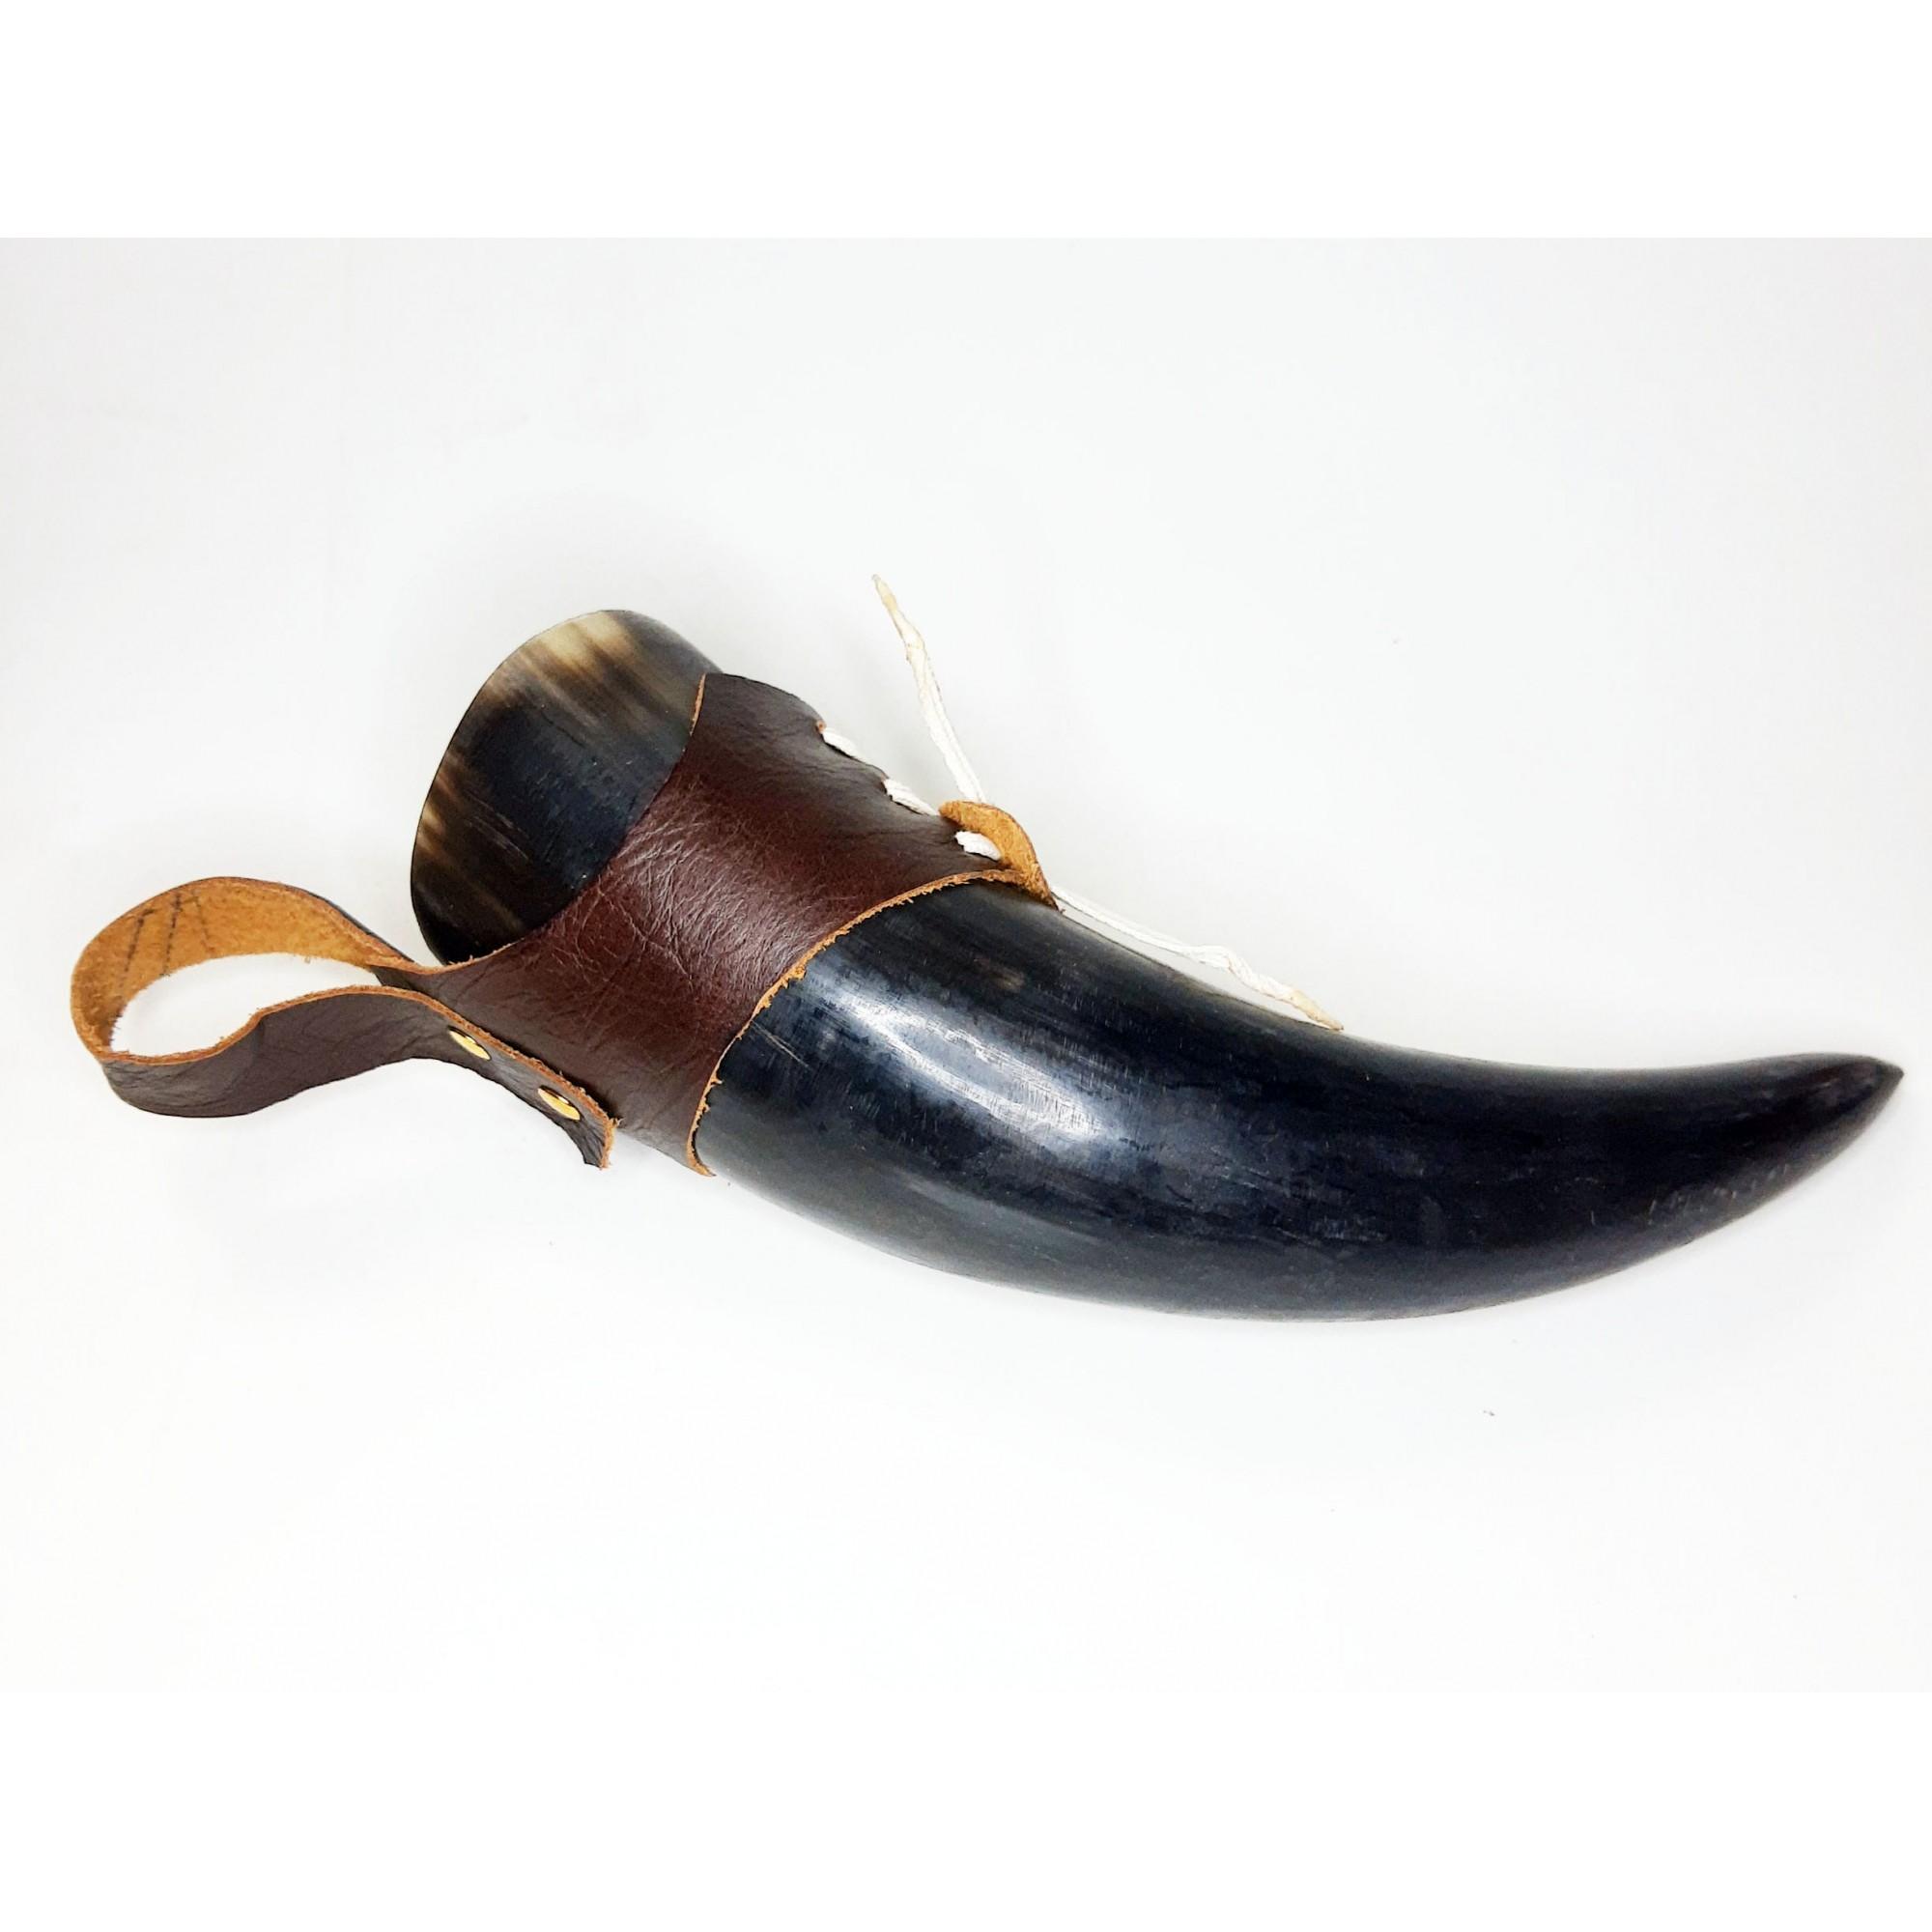 Drinking Horn 2 - 280ml